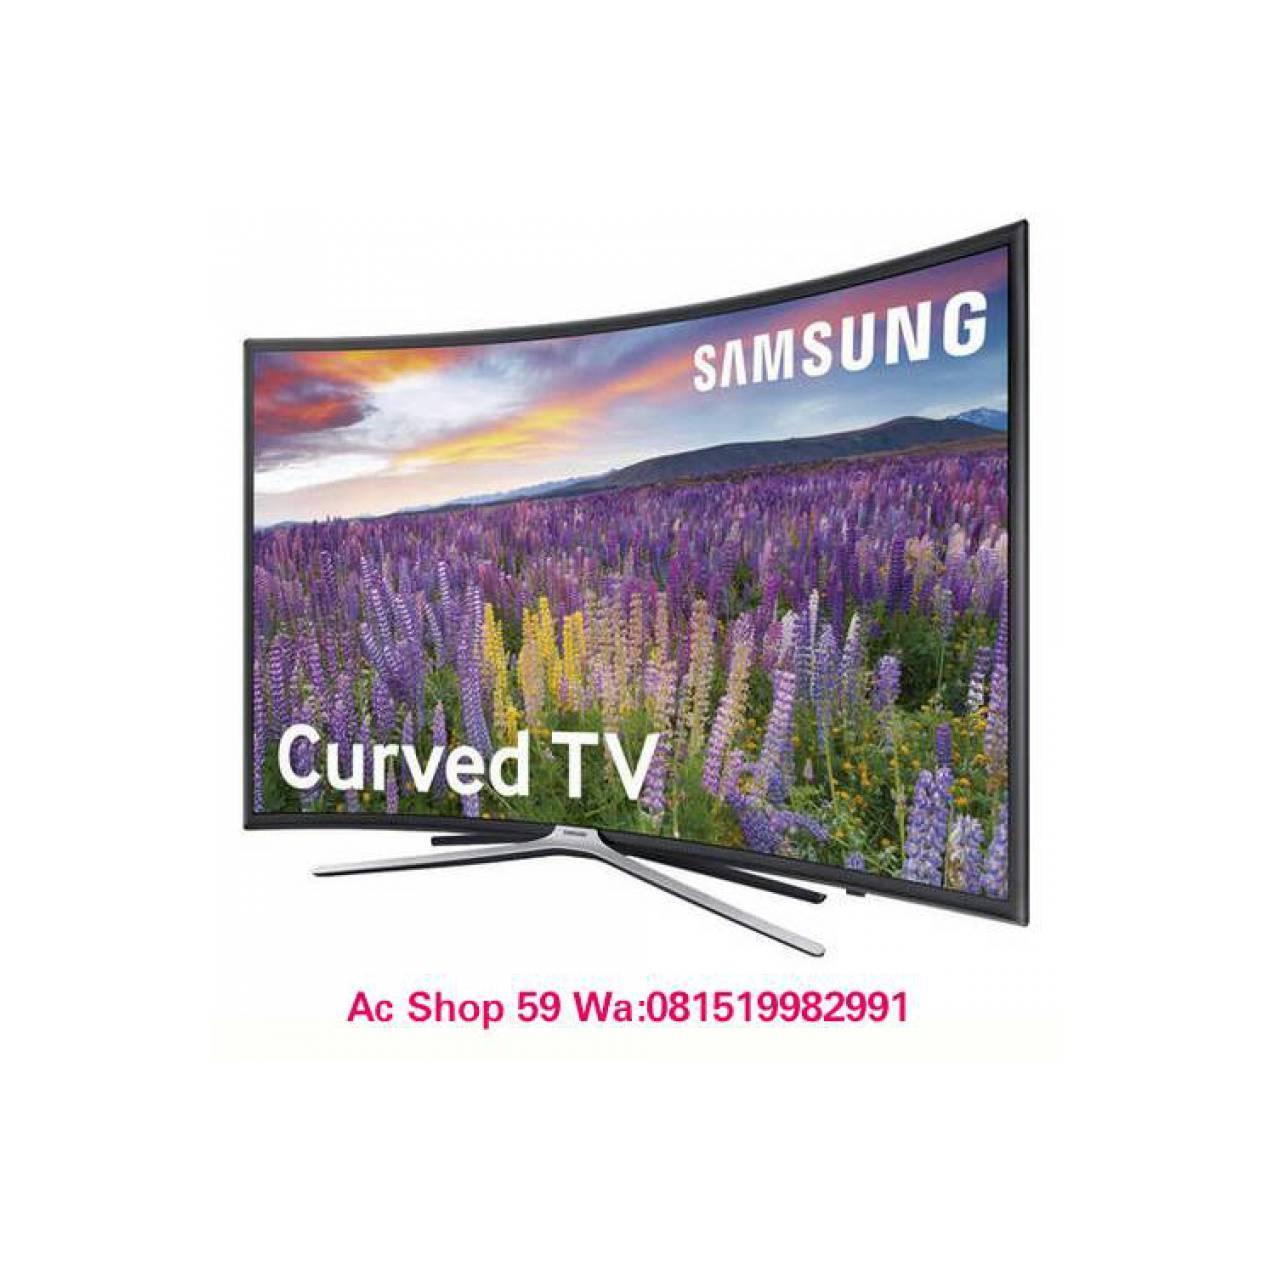 LED TV SAMSUNG 40 K-6300 CURVED FULL HD SMART TV DIGITAL DVB-T2 PROMO